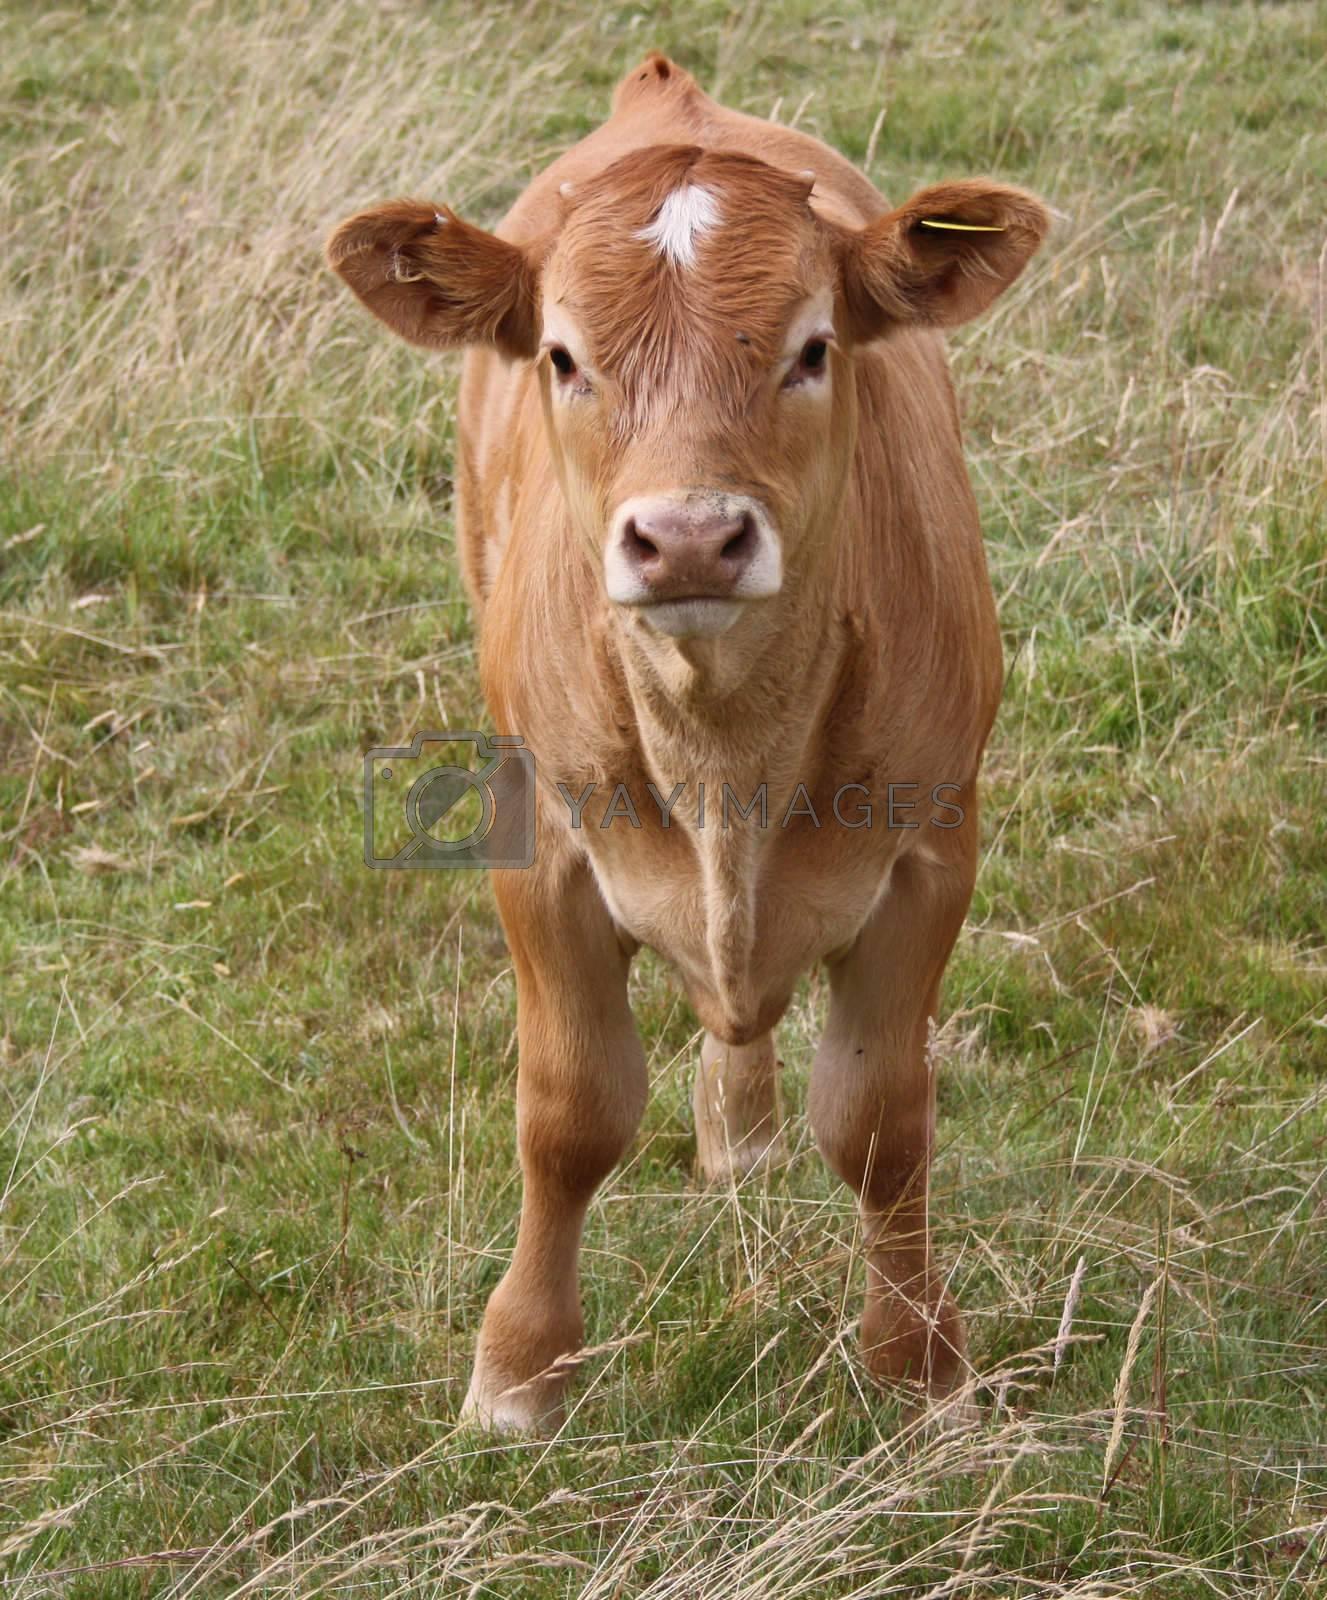 Royalty free image of cow grazing in field 2 by lizapixels